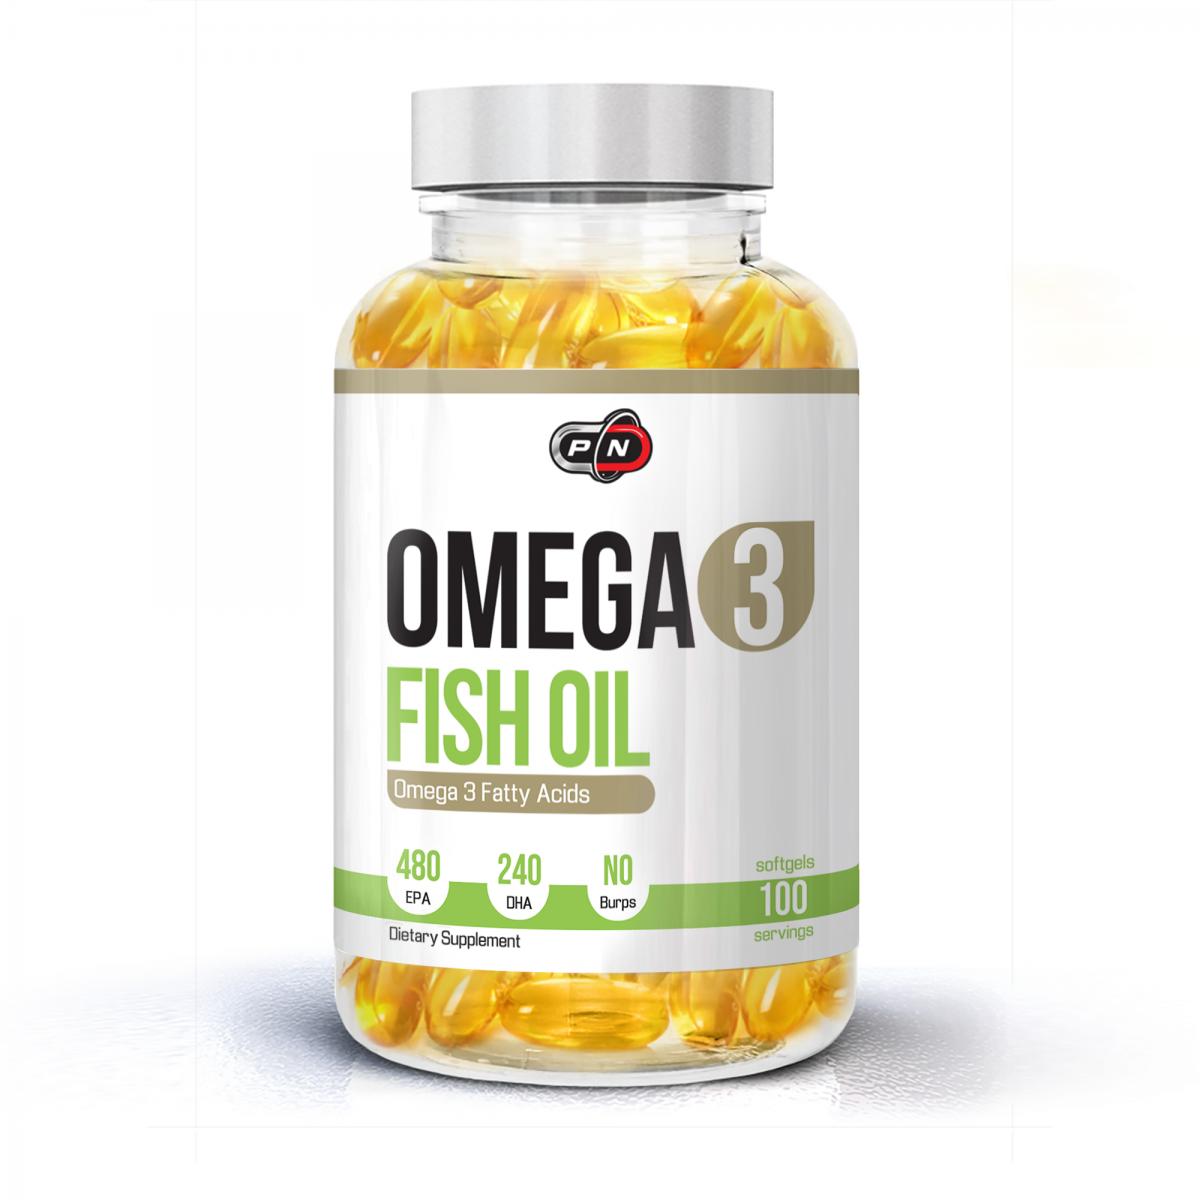 Pure Nutrition Omega 3 Fish Oil 100caps